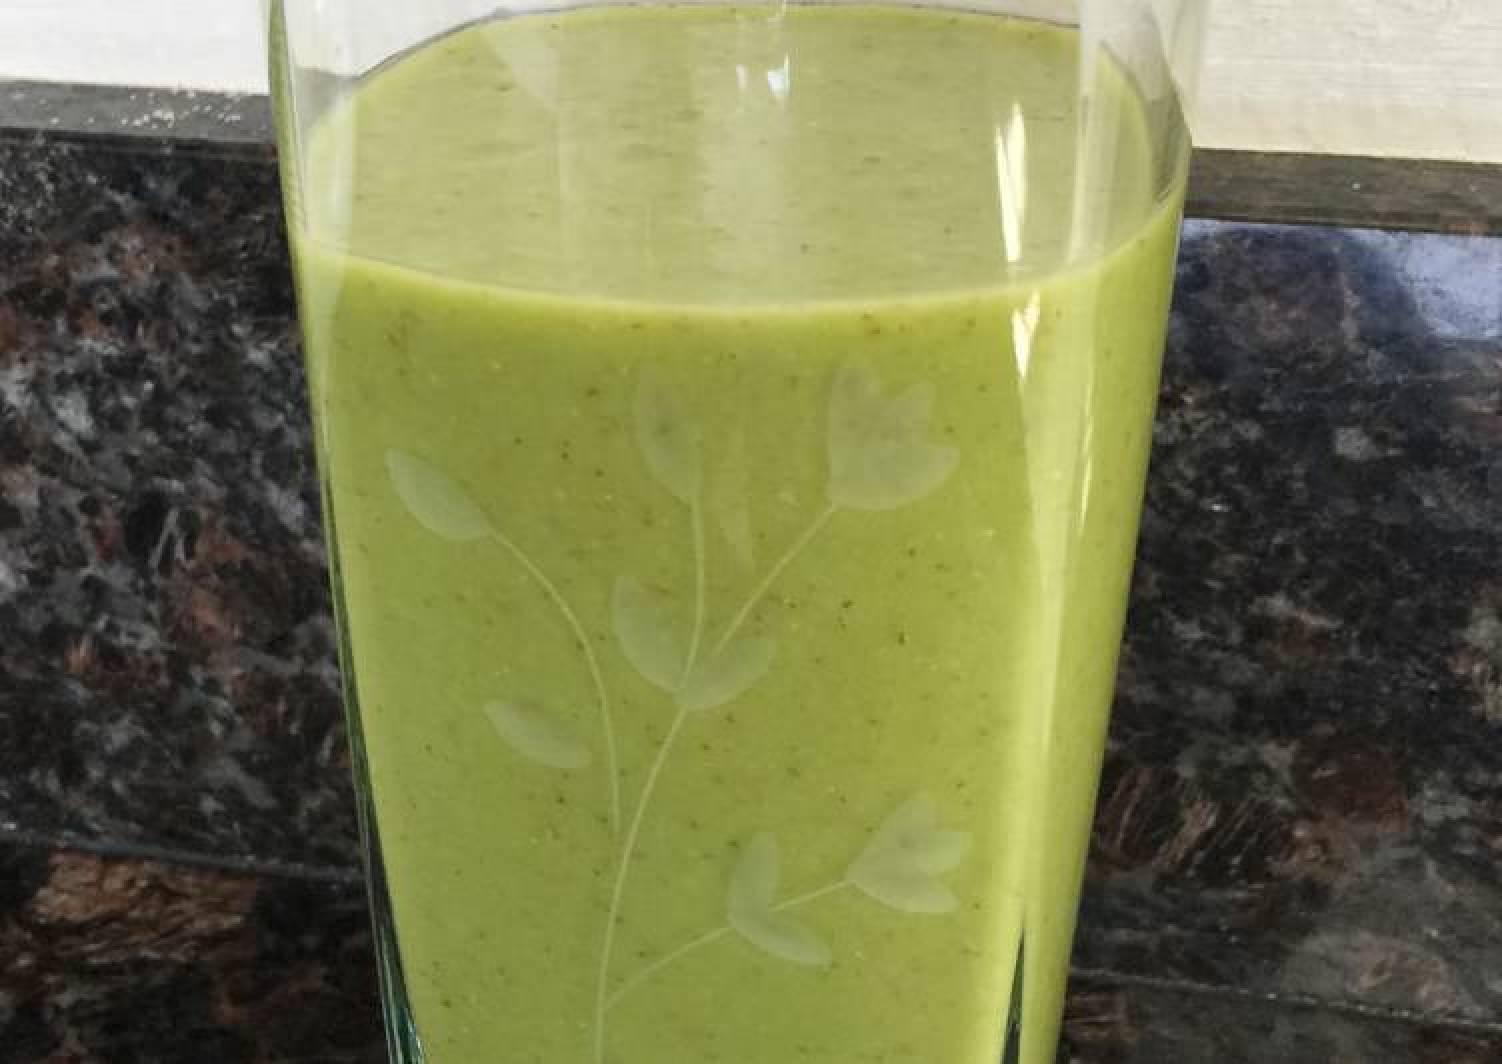 Green Morning Drink